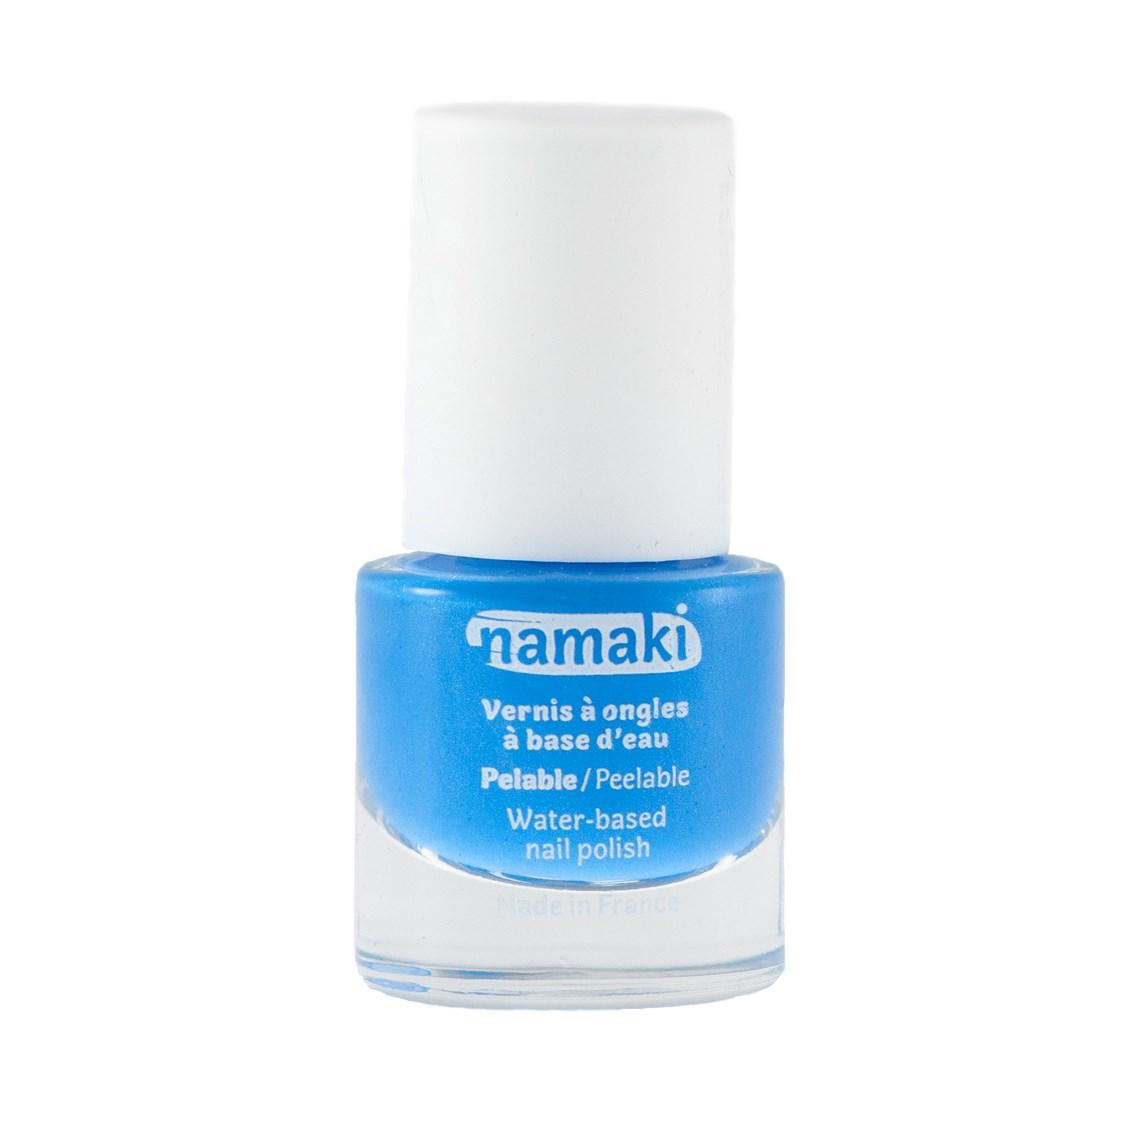 Doux Good - Vernis à ongles Namaki 08 Bleu ciel